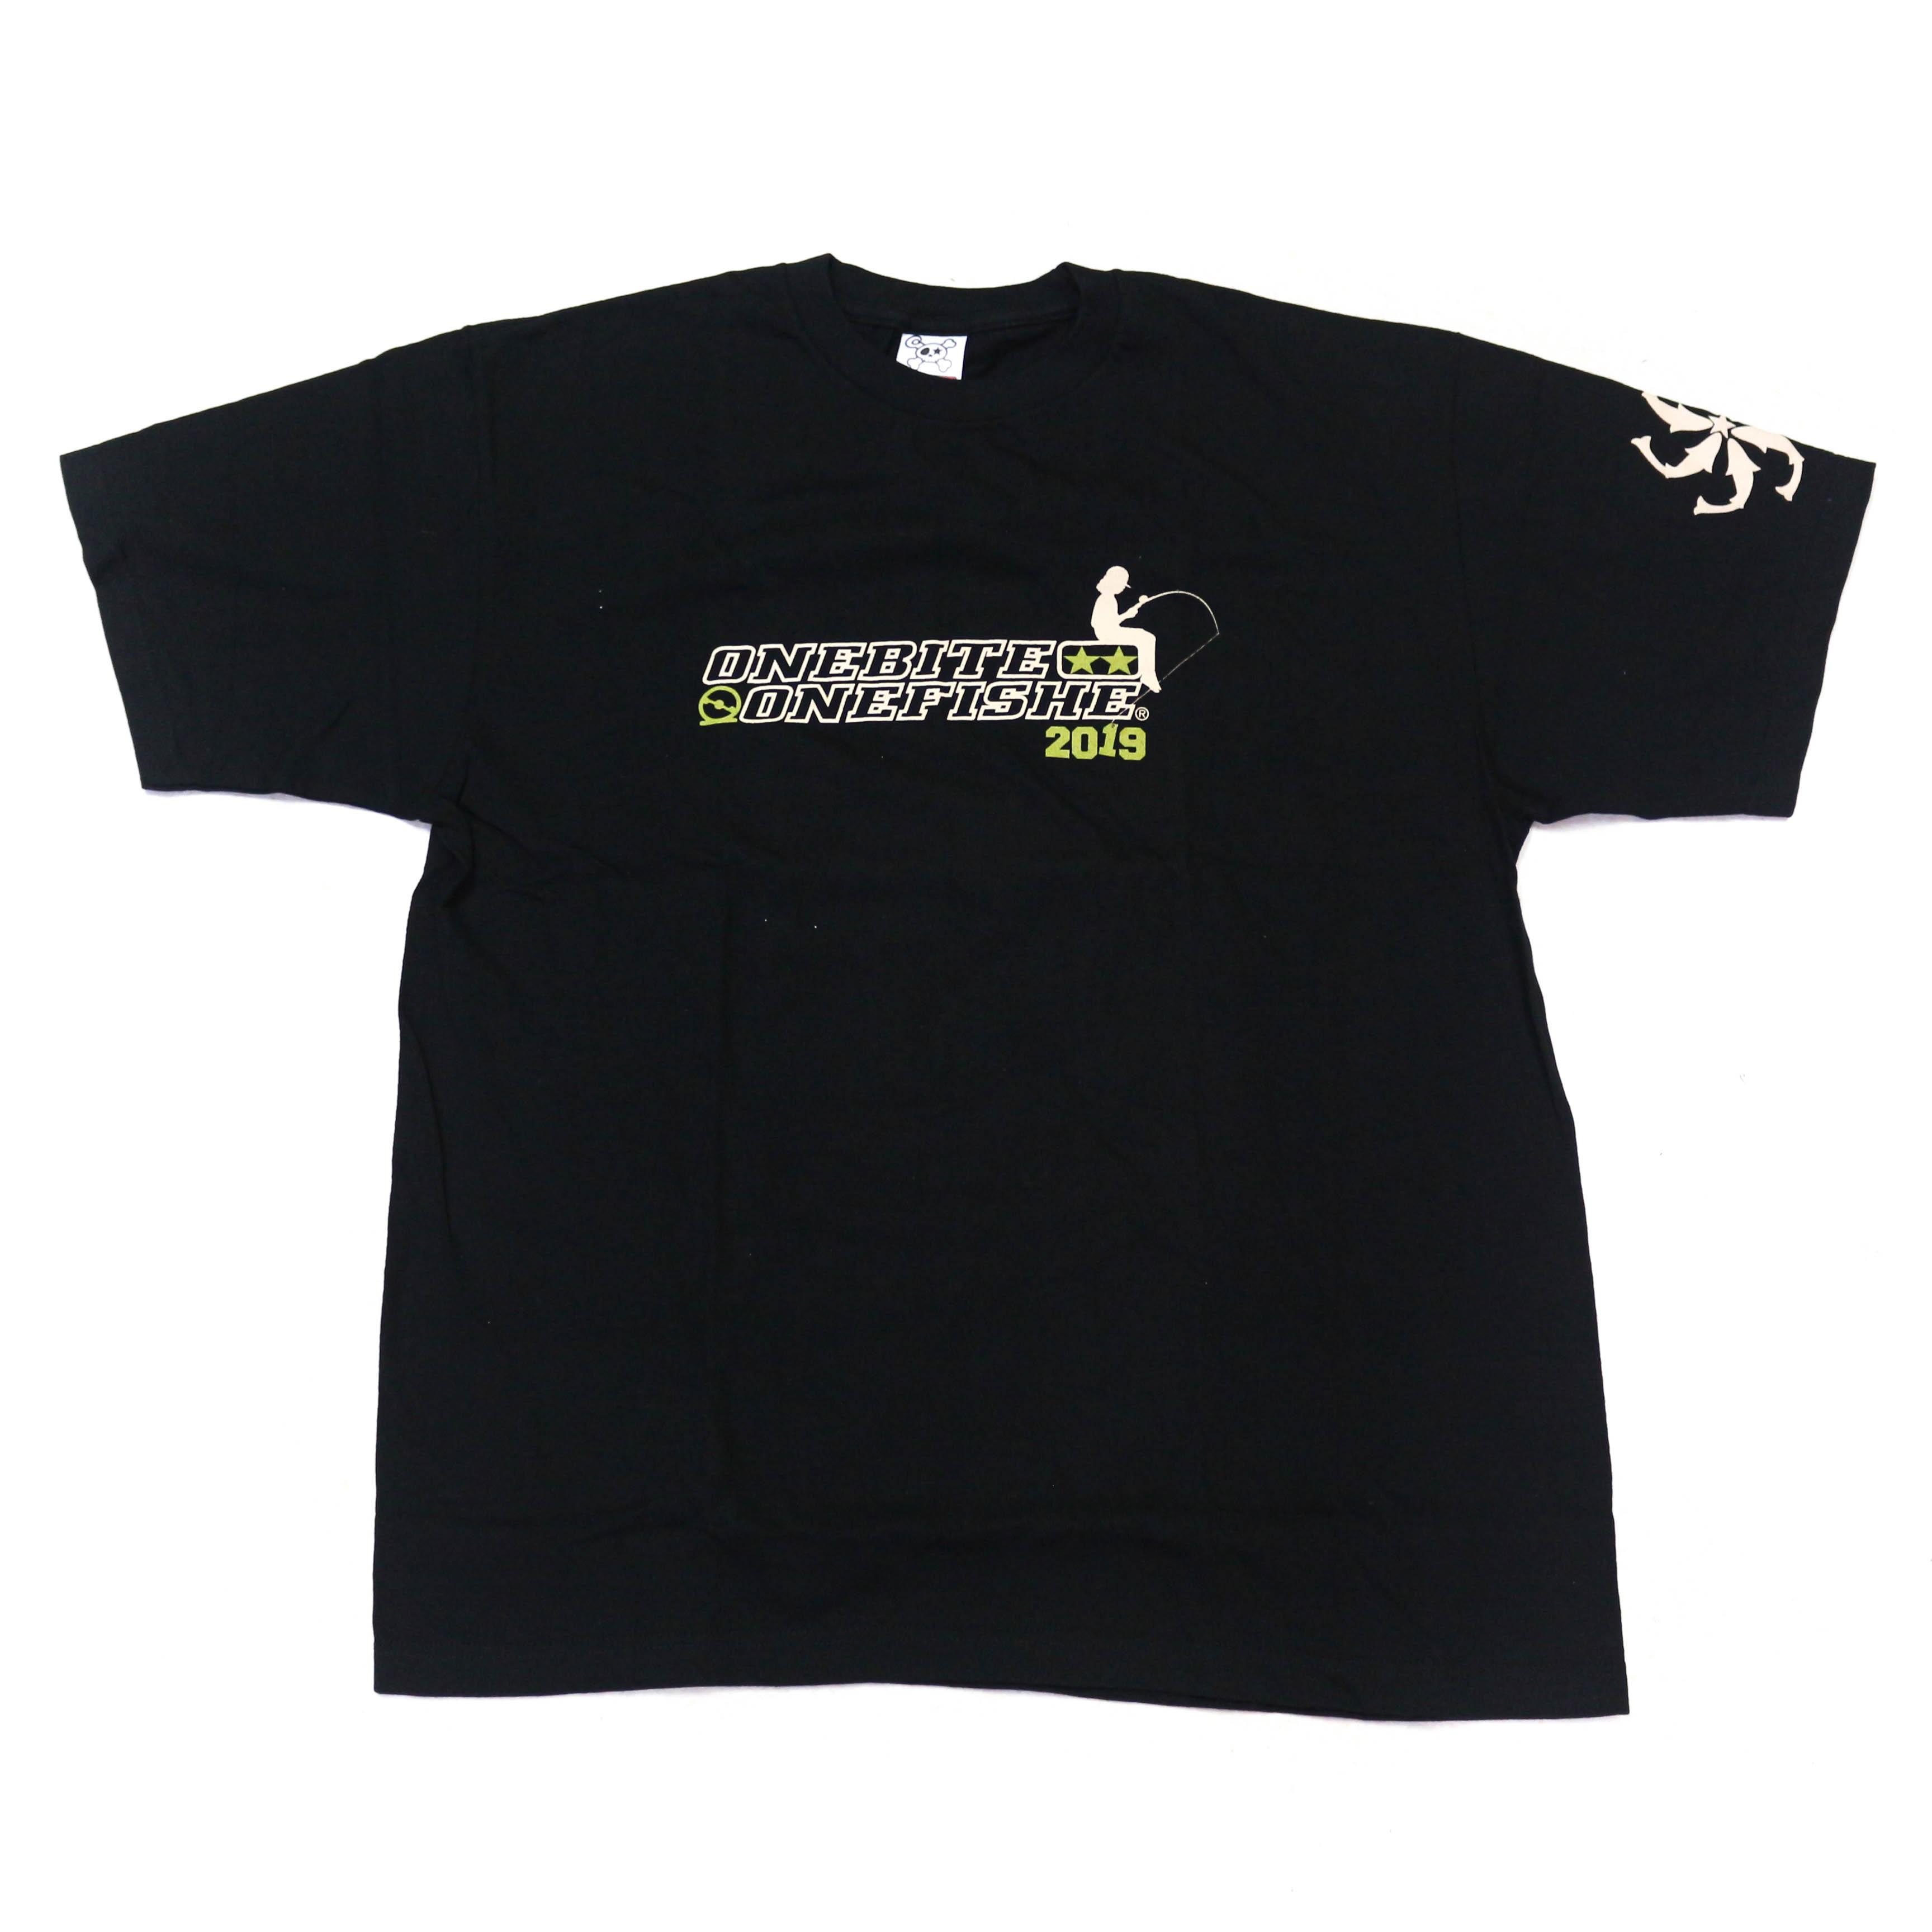 One Bite One Fish OBOF T-Shirt 2019 Short Sleeve Black Size XL (2007)